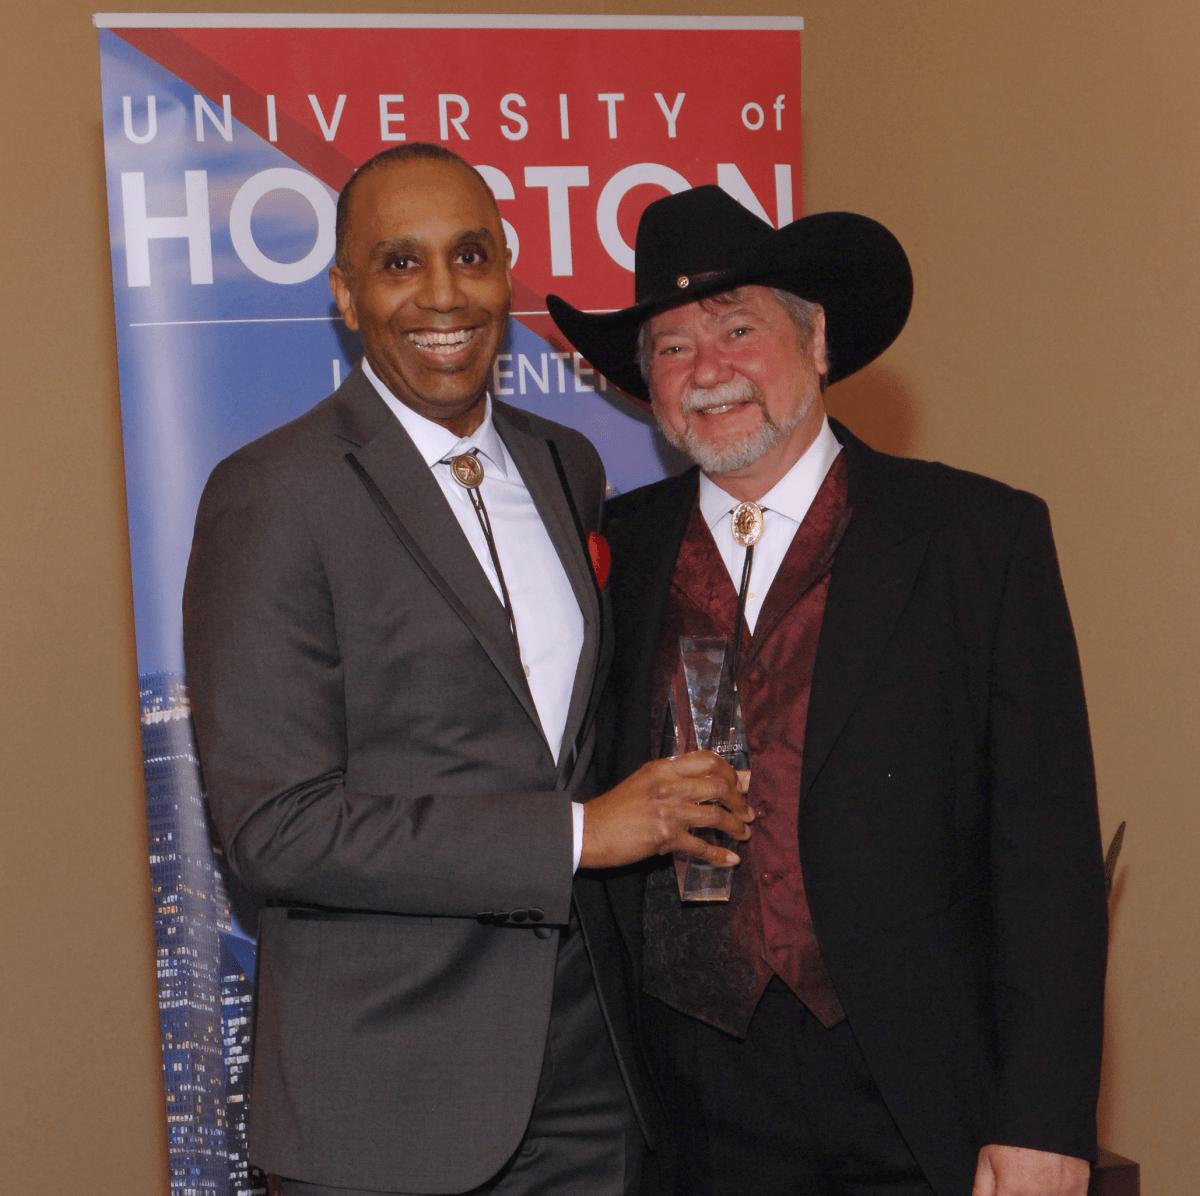 UH Law gala, April 2016, Dean Leonard Baynes, Jim Roach